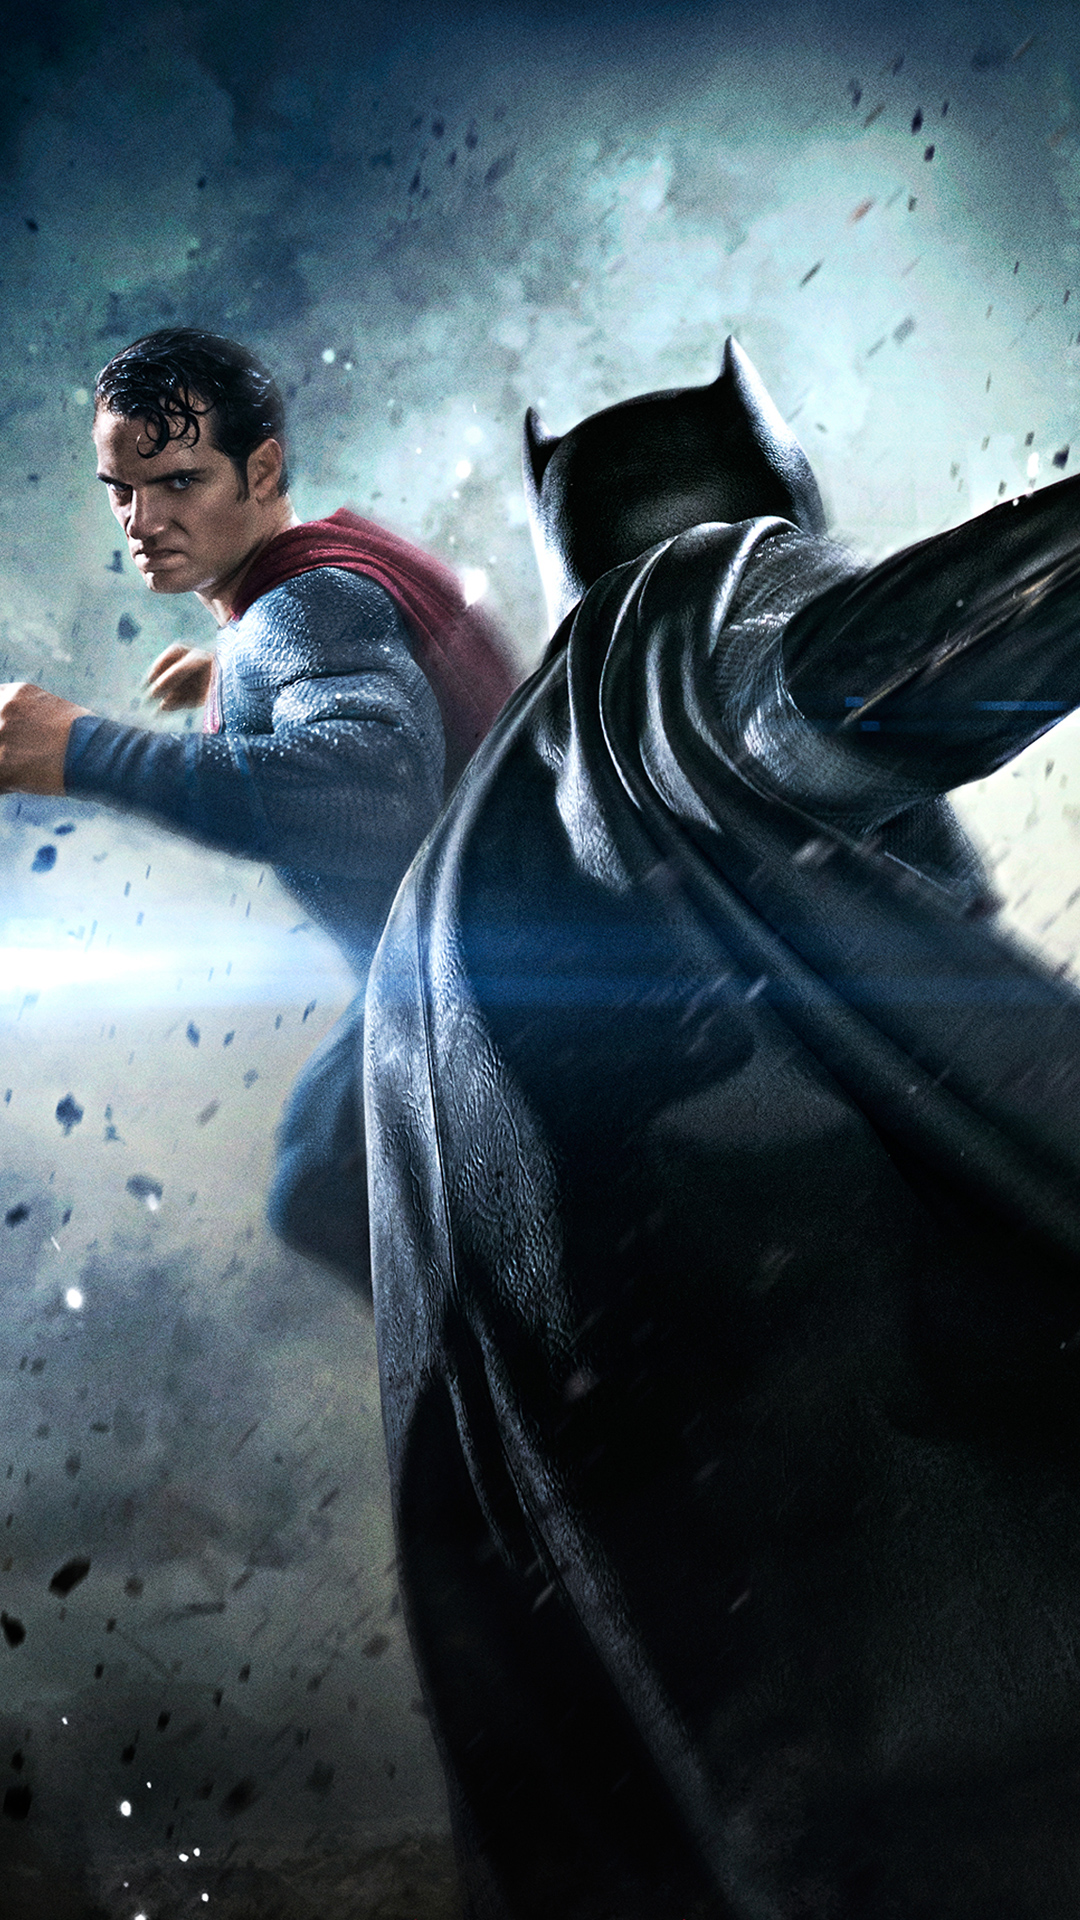 Superman Batman Movie Wallpaper batman-vs-superman-mov...